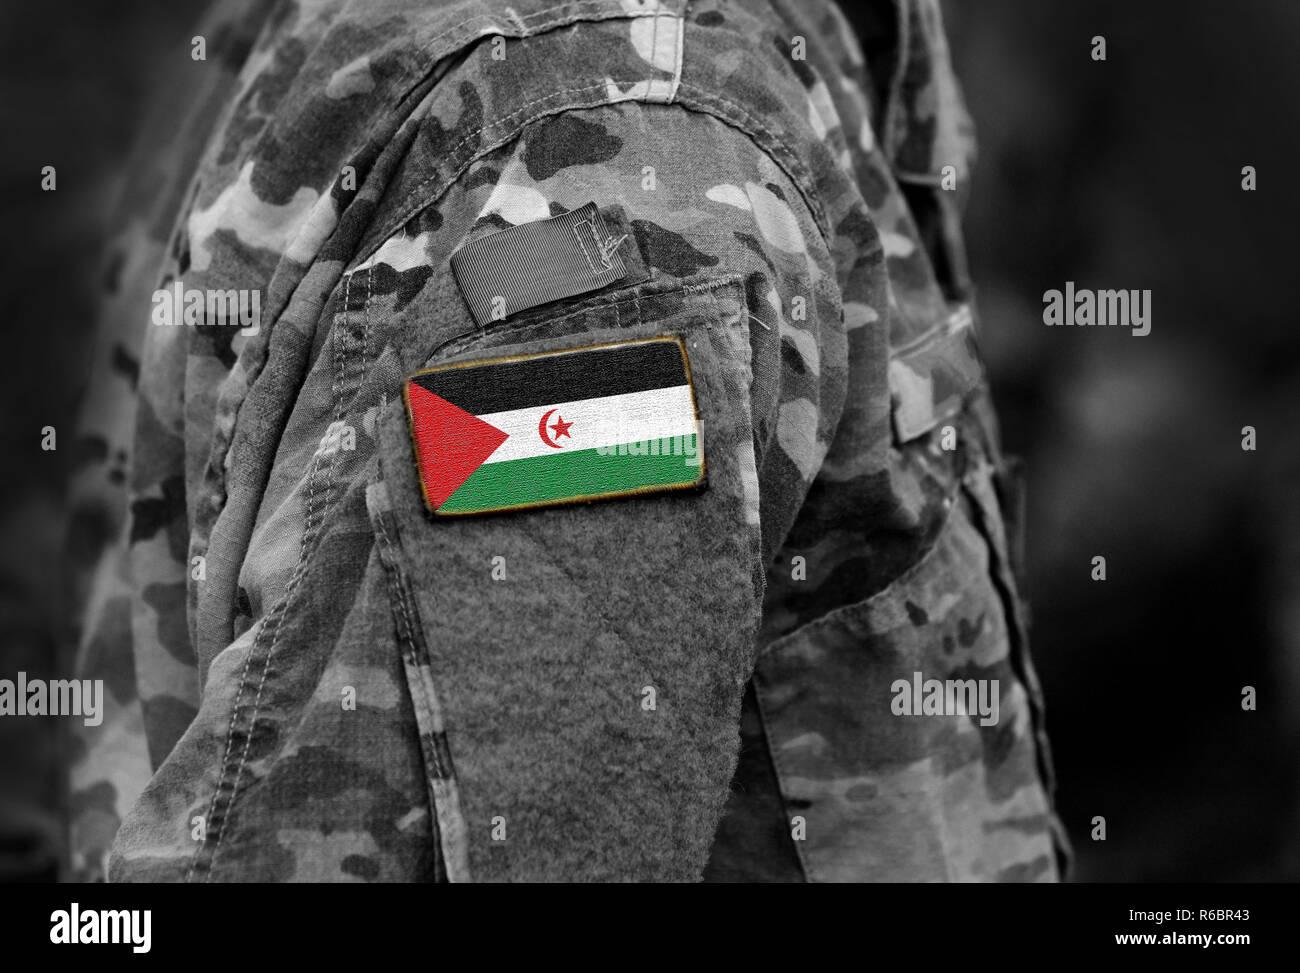 Sahrawi Arab Democratic Republic flag on soldiers arm. Sahrawi Arab Democratic Republic flag on military uniform. Army, troops, Africa (collage). - Stock Image